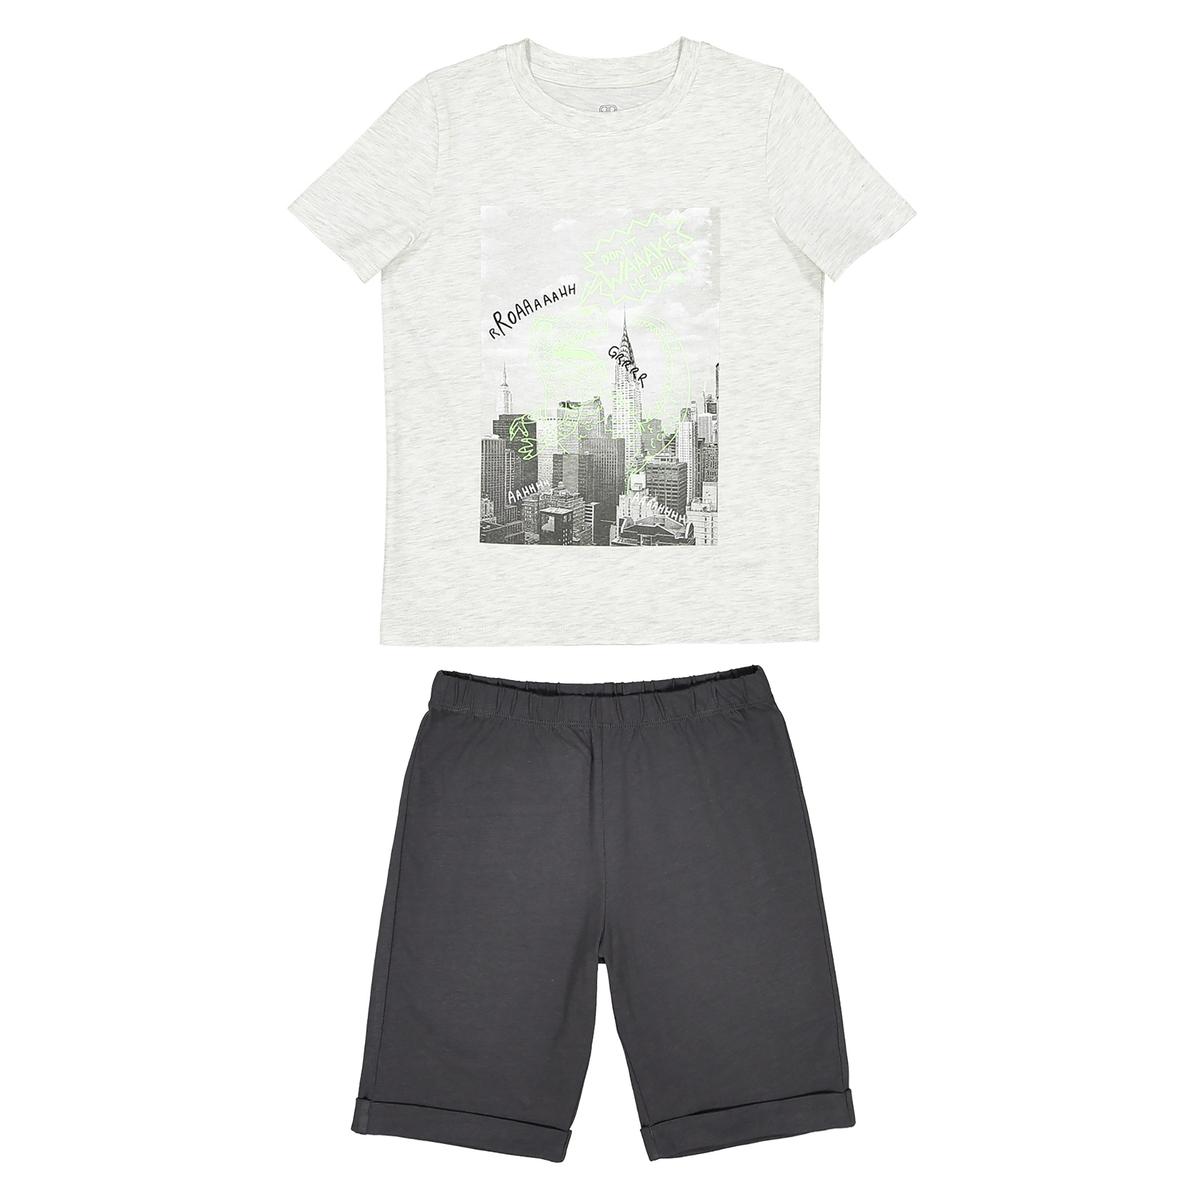 Пижама с шортами с рисунком, 2-12 лет пижама с шортами с рисунком